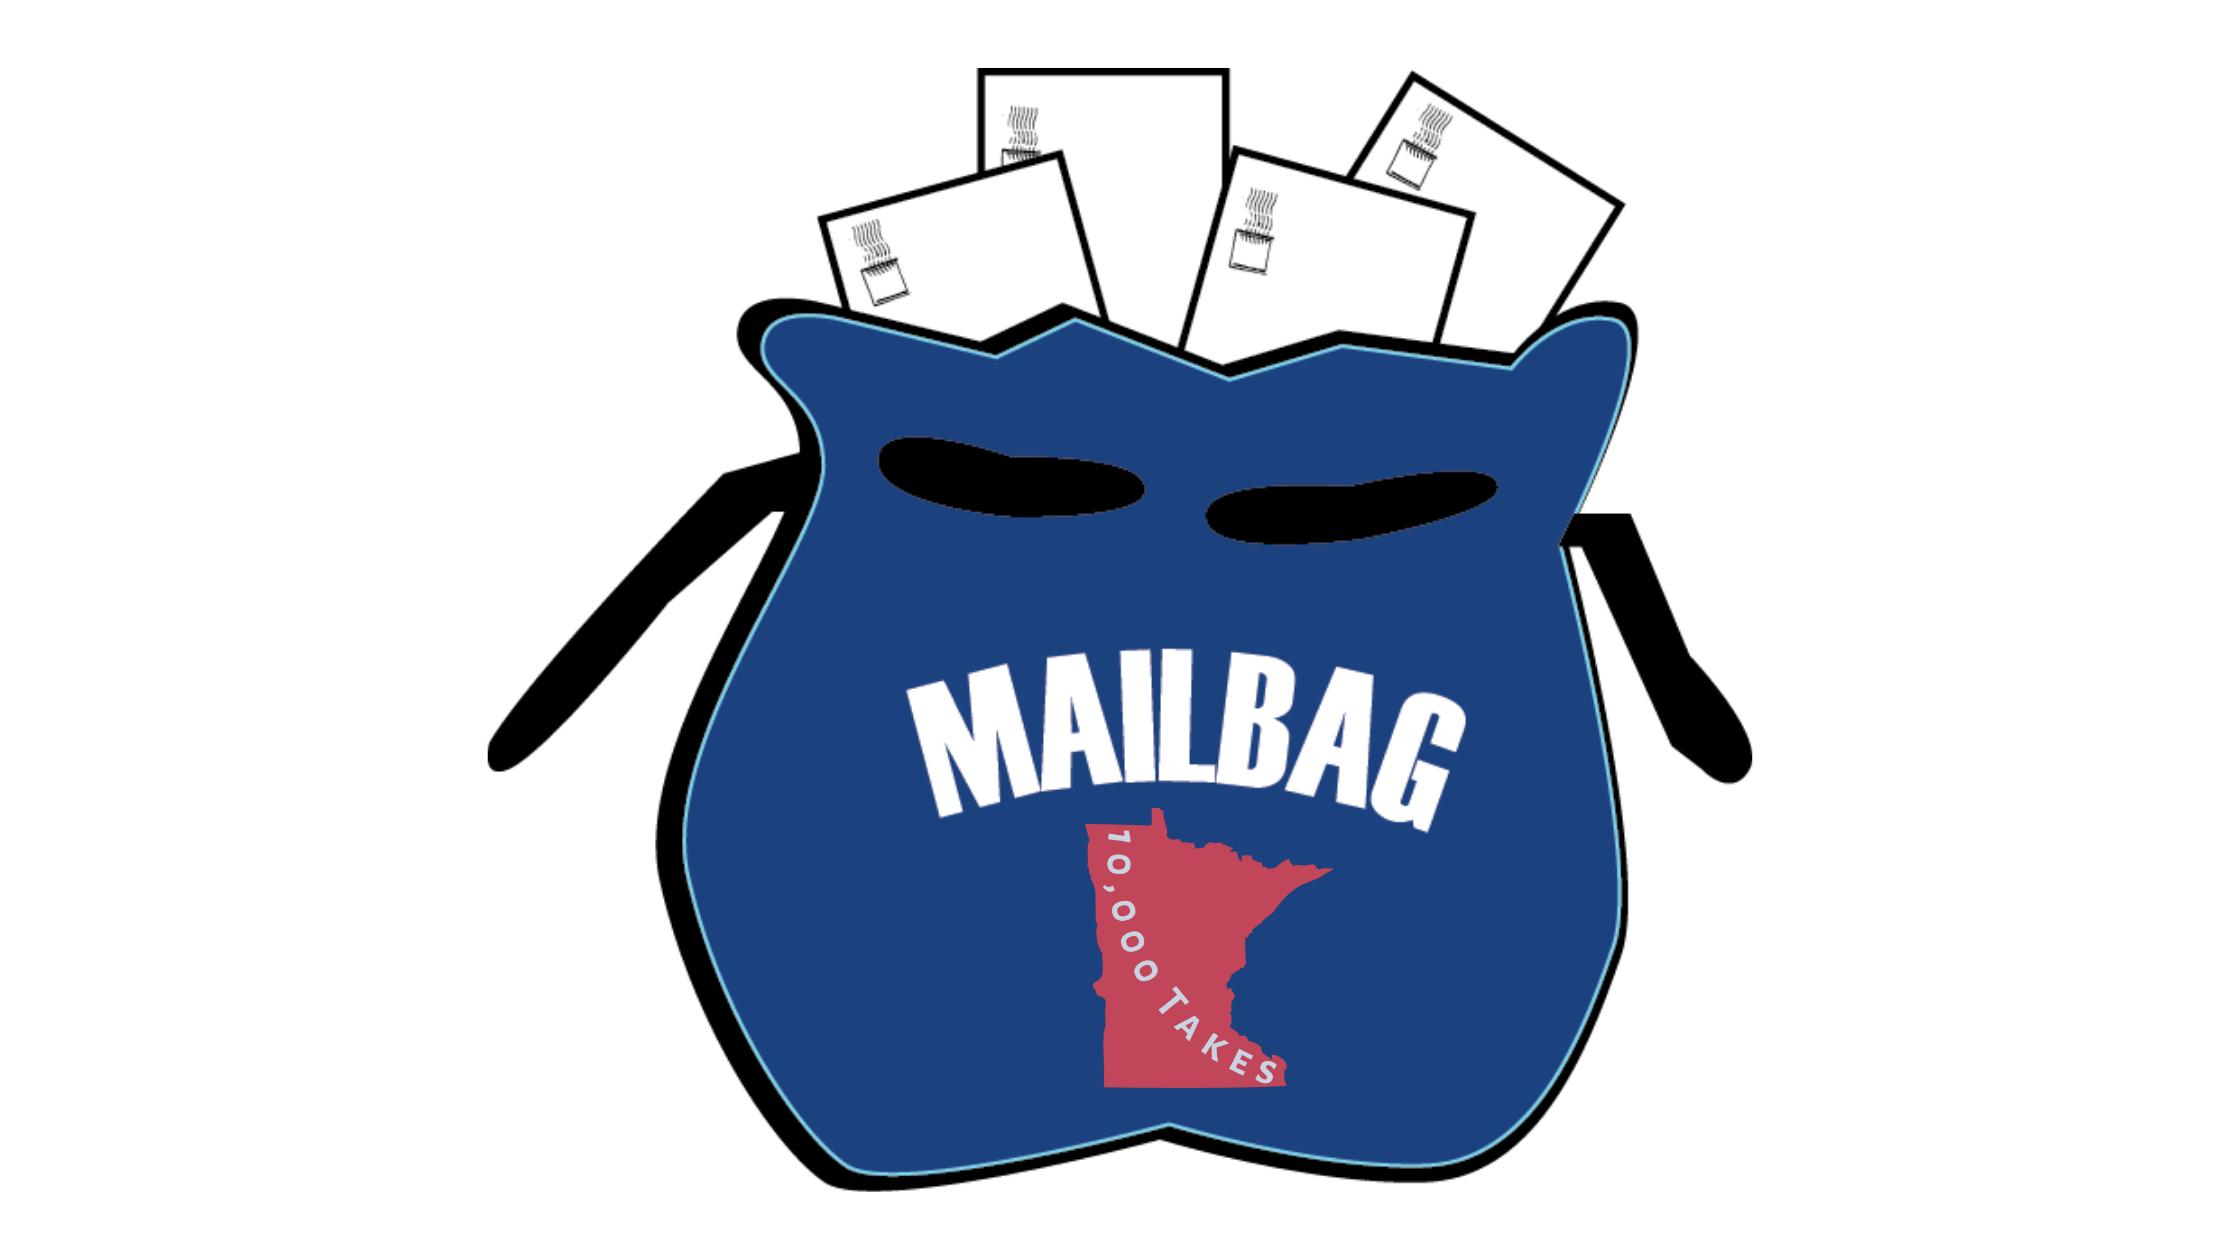 10K Takes Mailbag